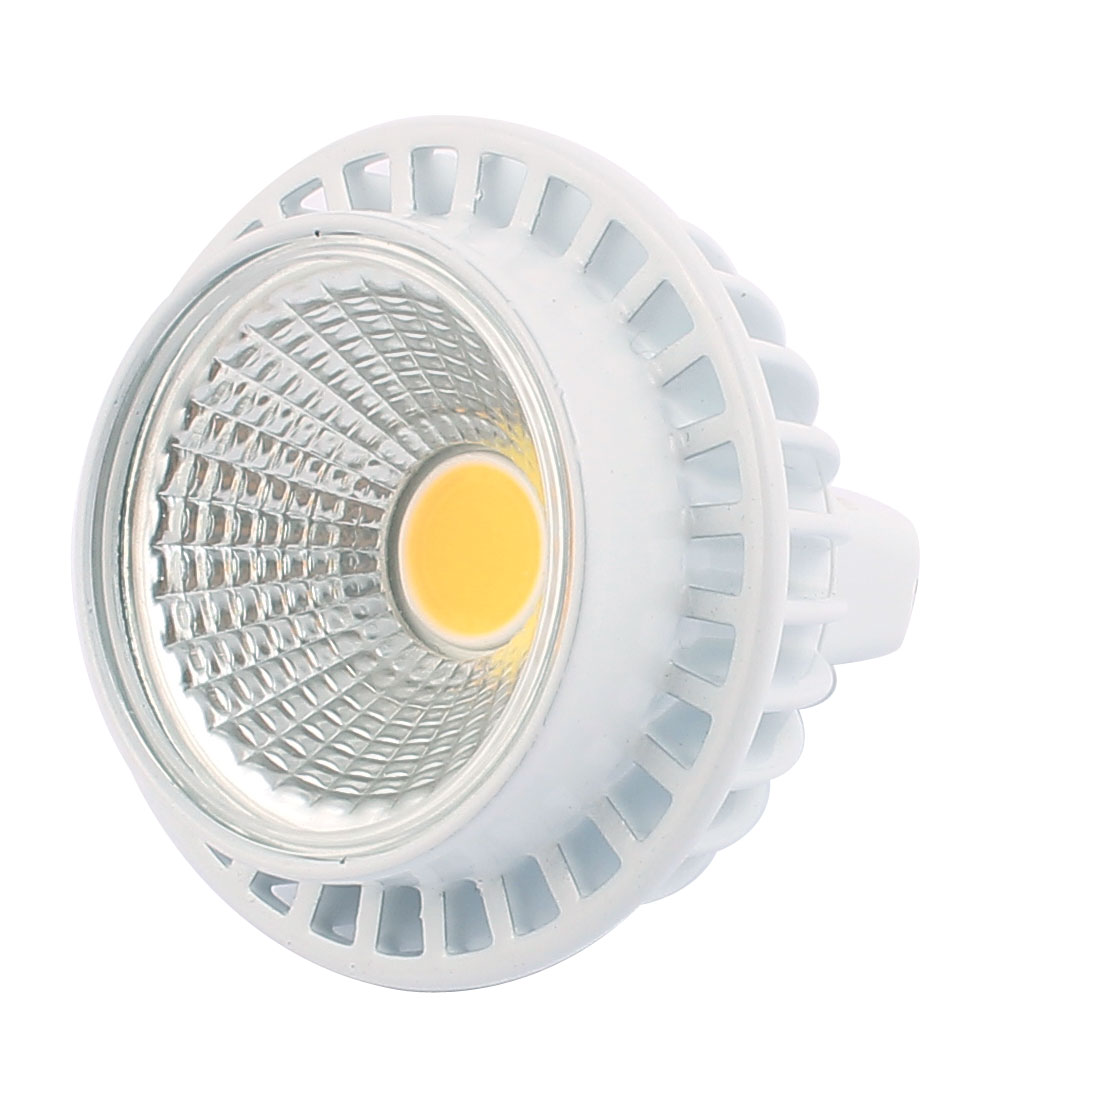 DC12V 3W MR16 COB LED Spotlight Lamp Bulb Practical Downlight Pure White